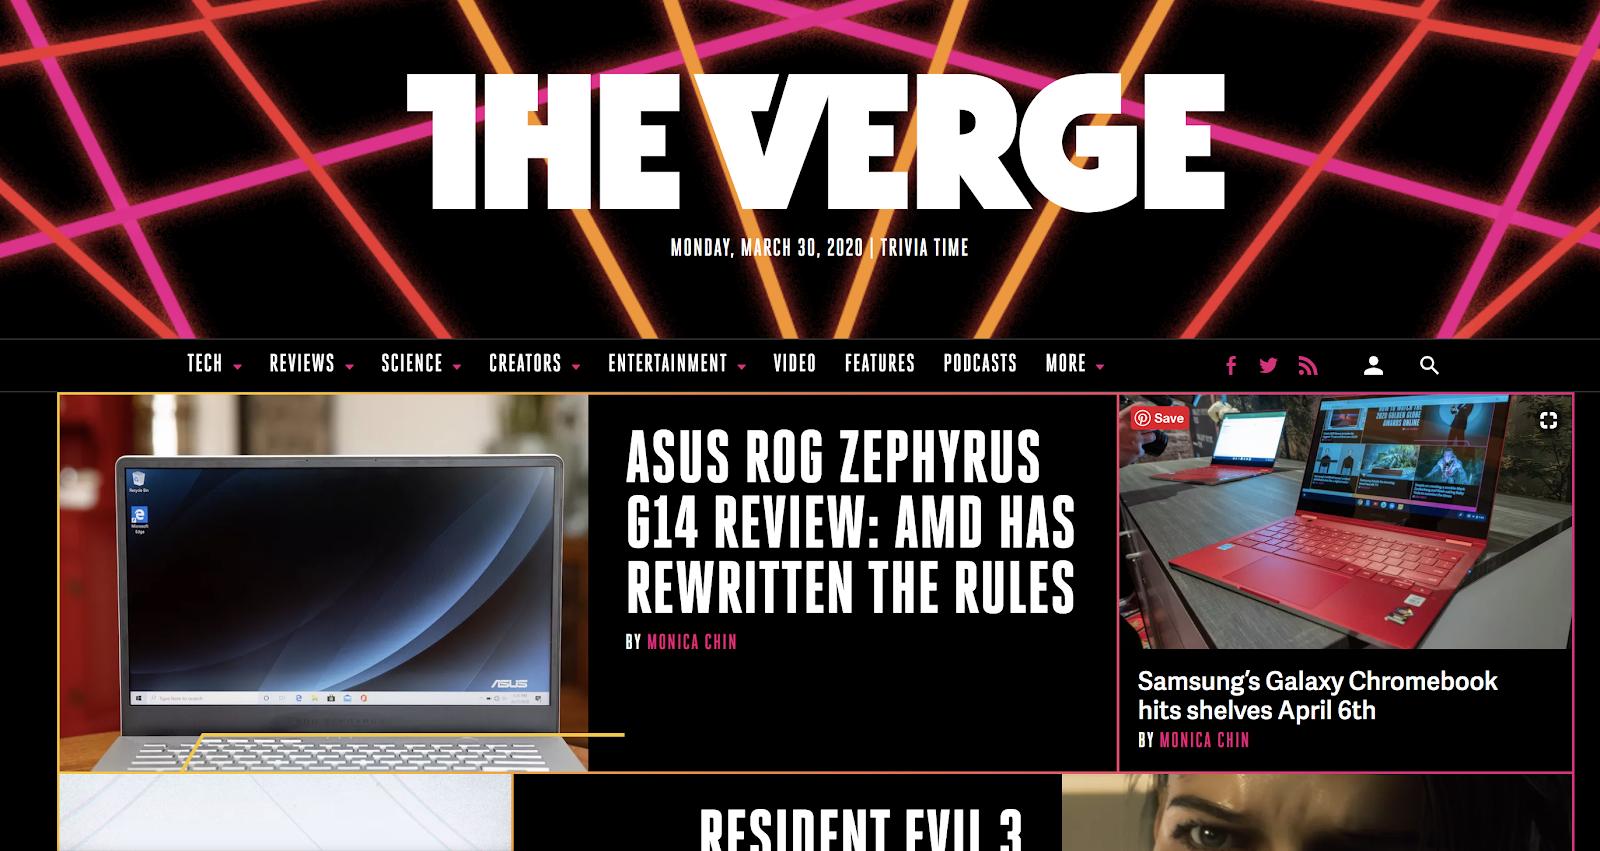 The Verge Homepage Screenshot (Blog Layout Examples)